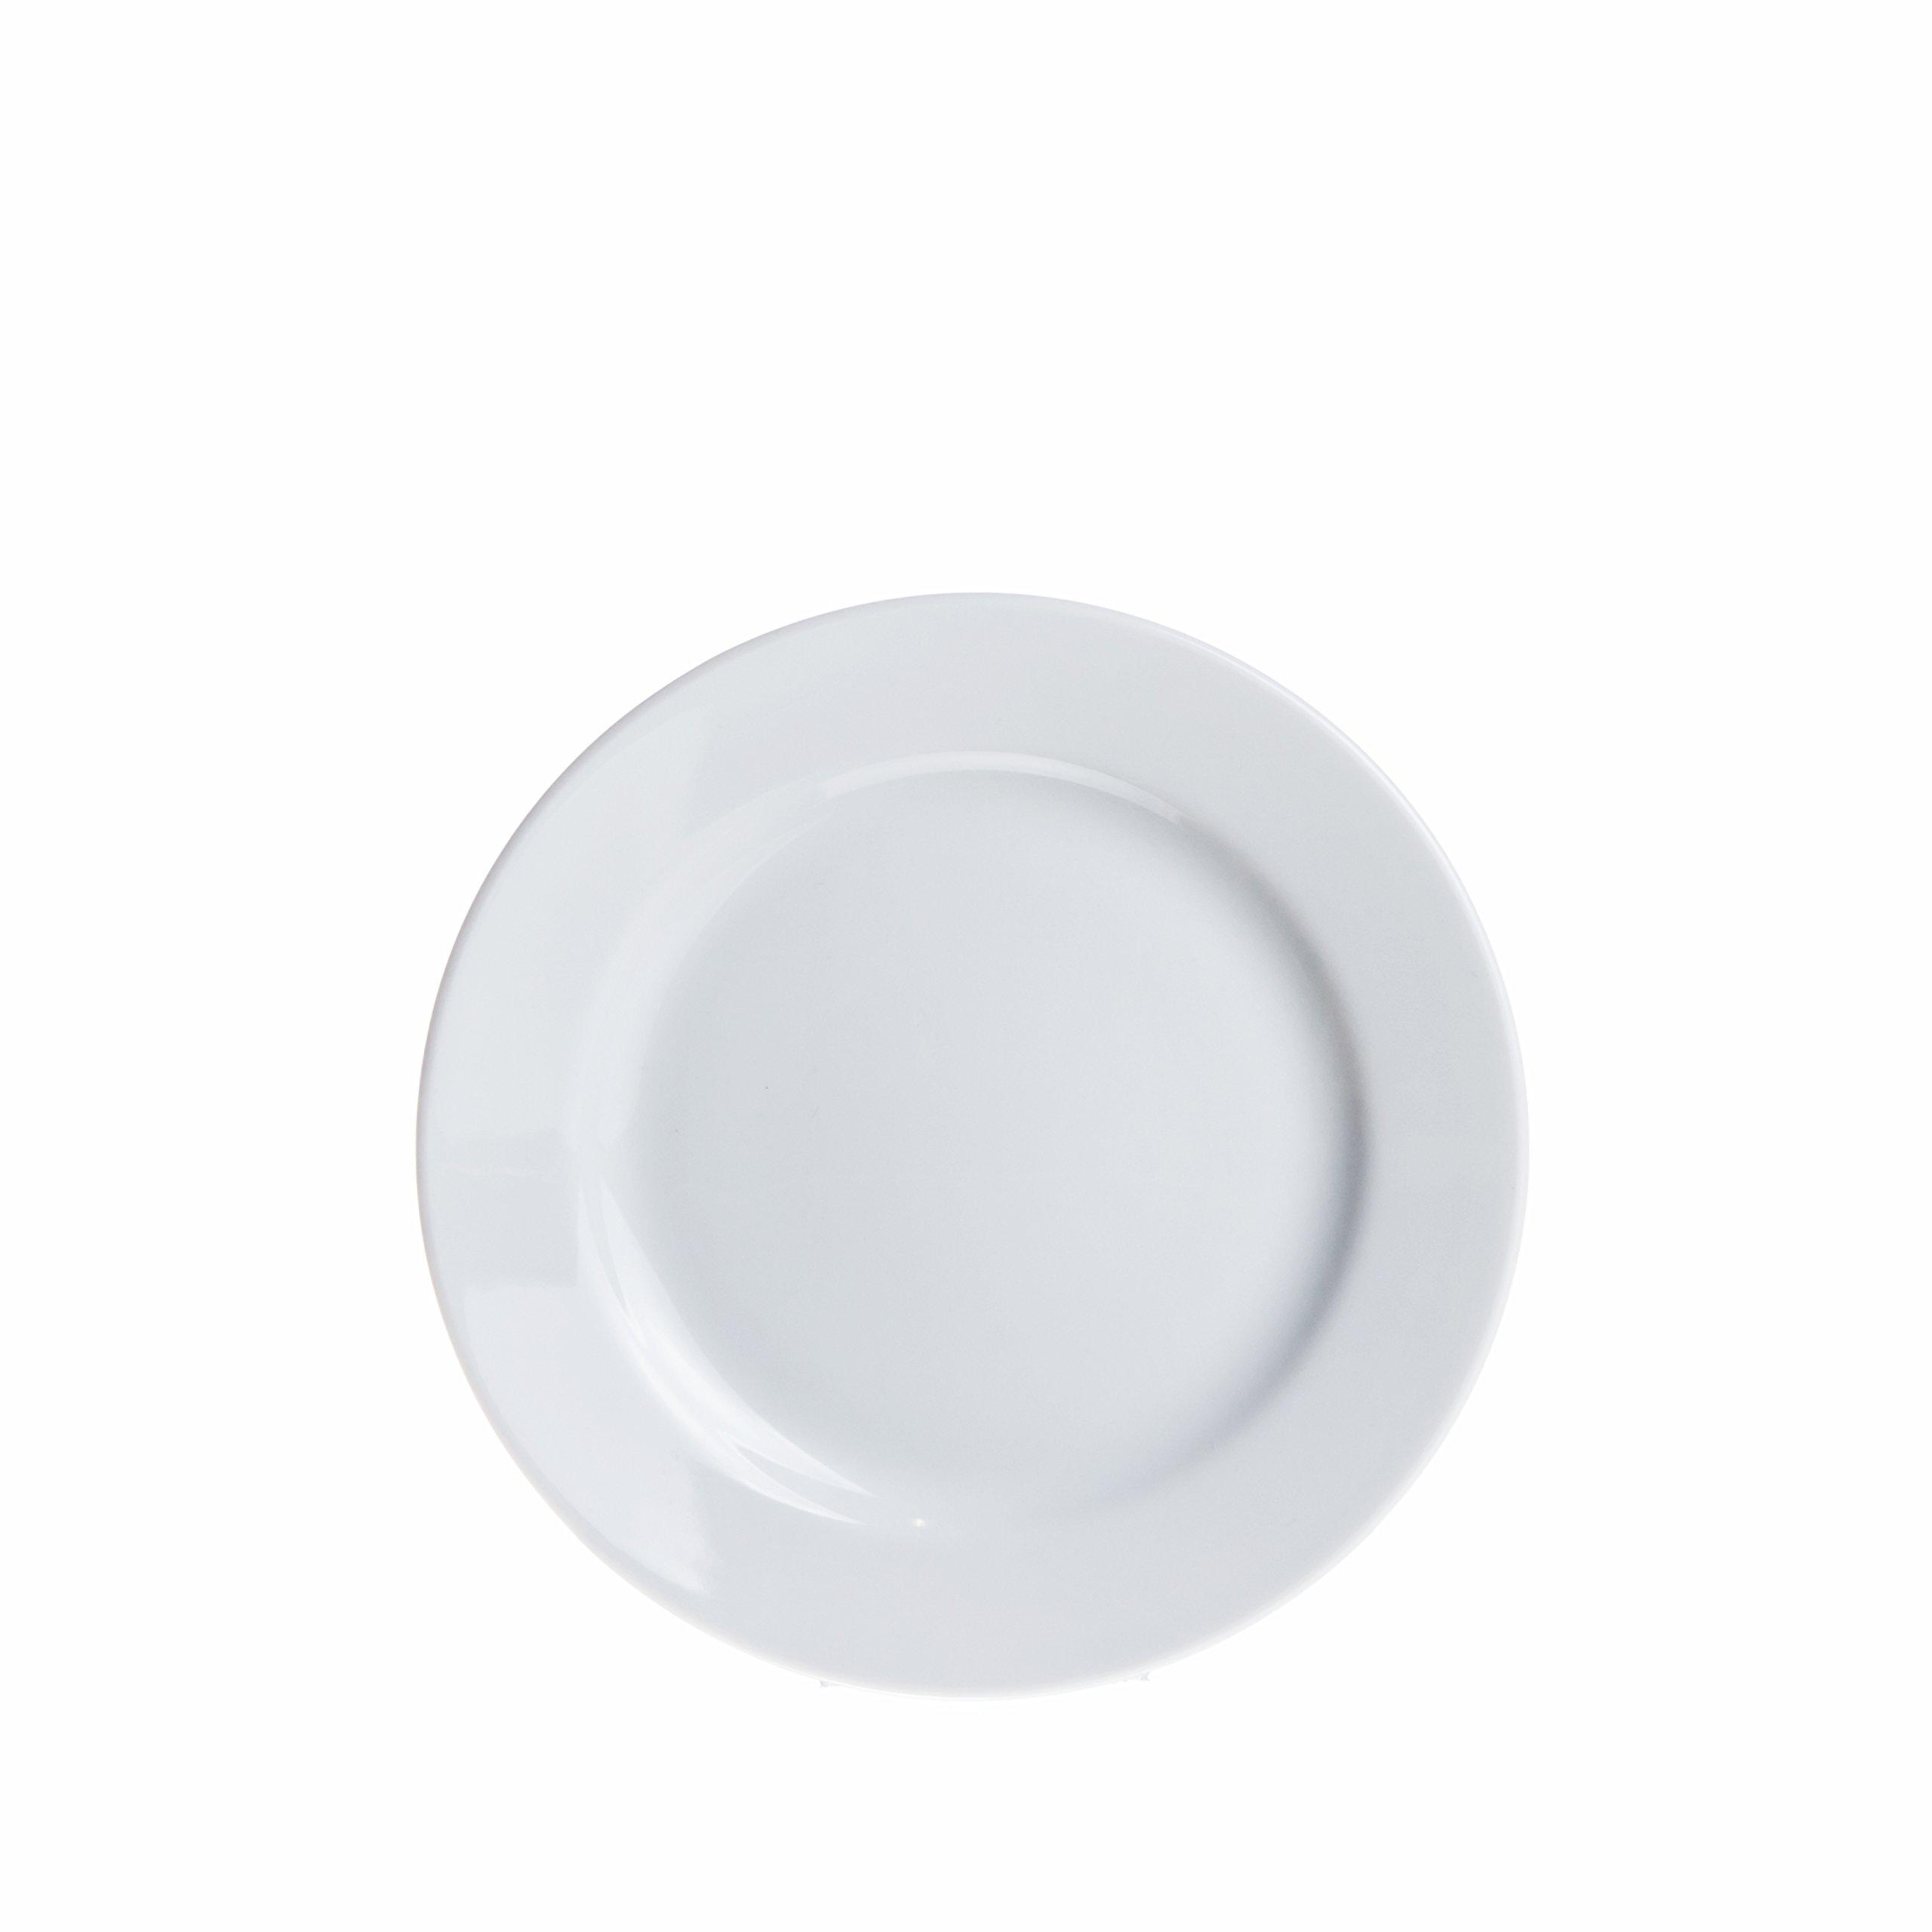 6-Piece Dinner/Soup/Dessert Plates Set, White Porcelain, Restaurant&Hotel Quality (6.6'' Dessert Plates)